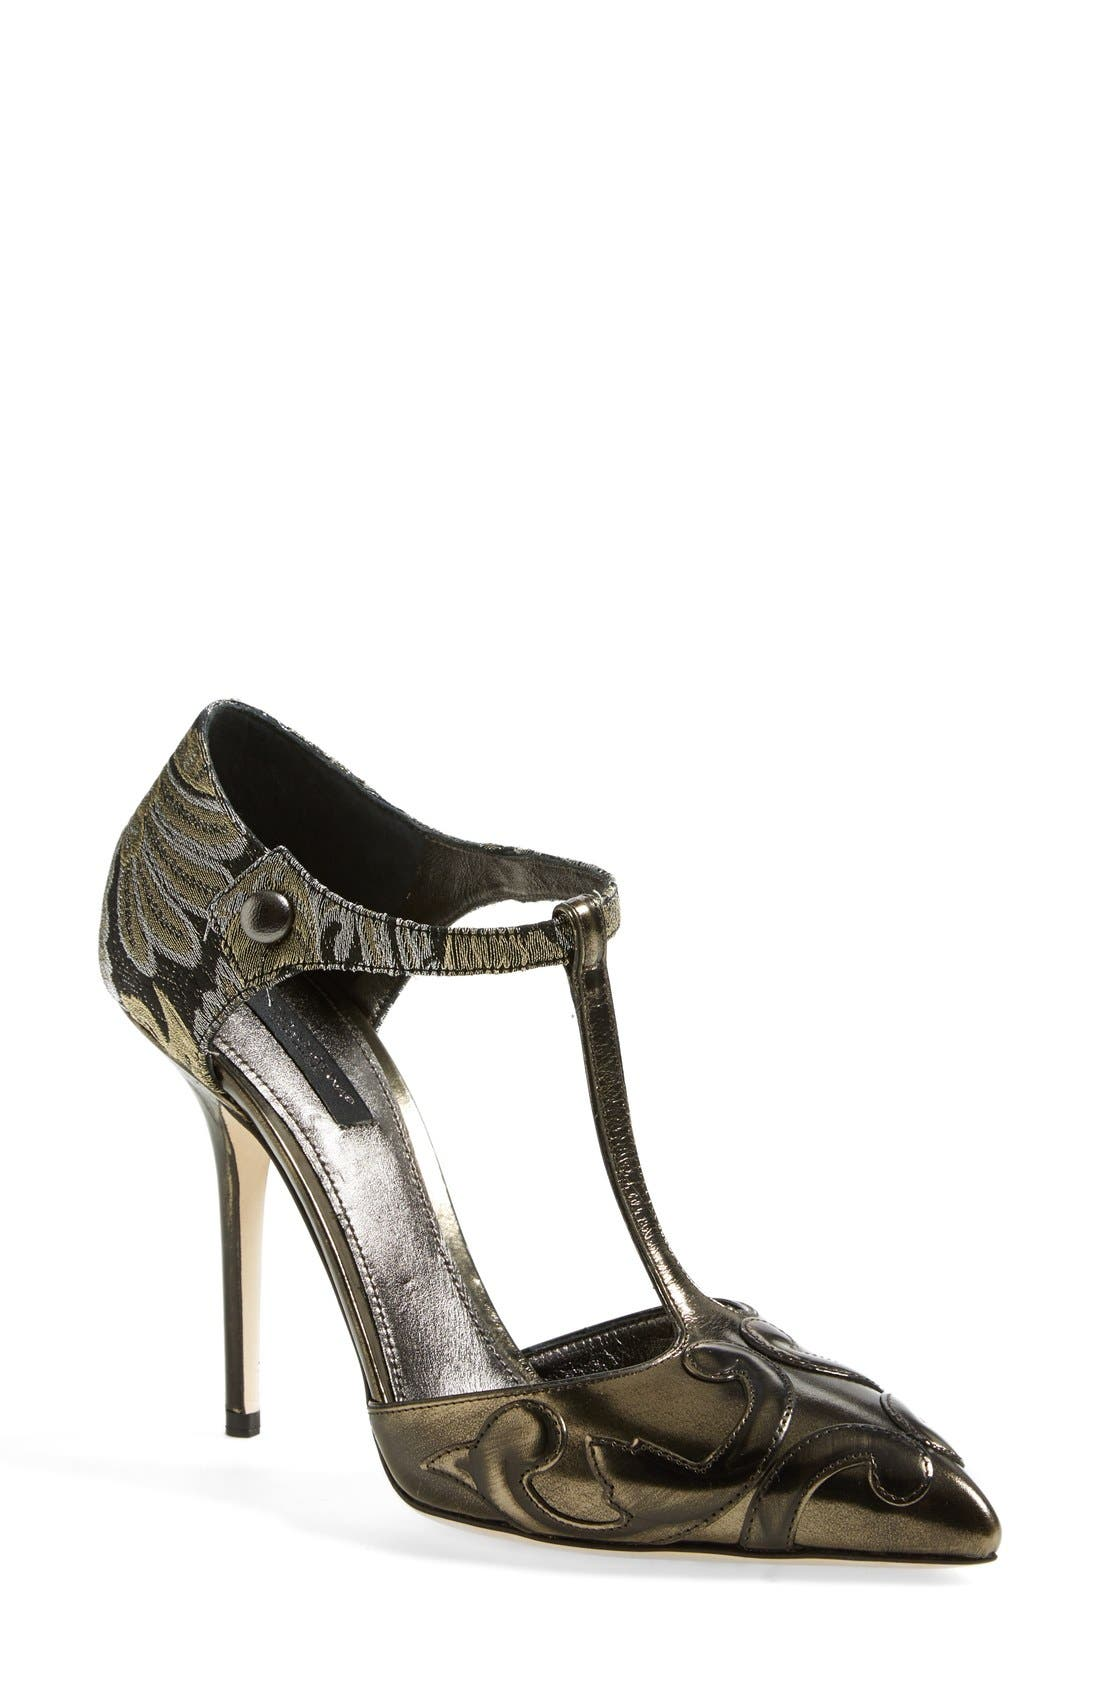 Alternate Image 1 Selected - Dolce&Gabbana Jacquard Pointy Toe T-Strap Pump (Women)